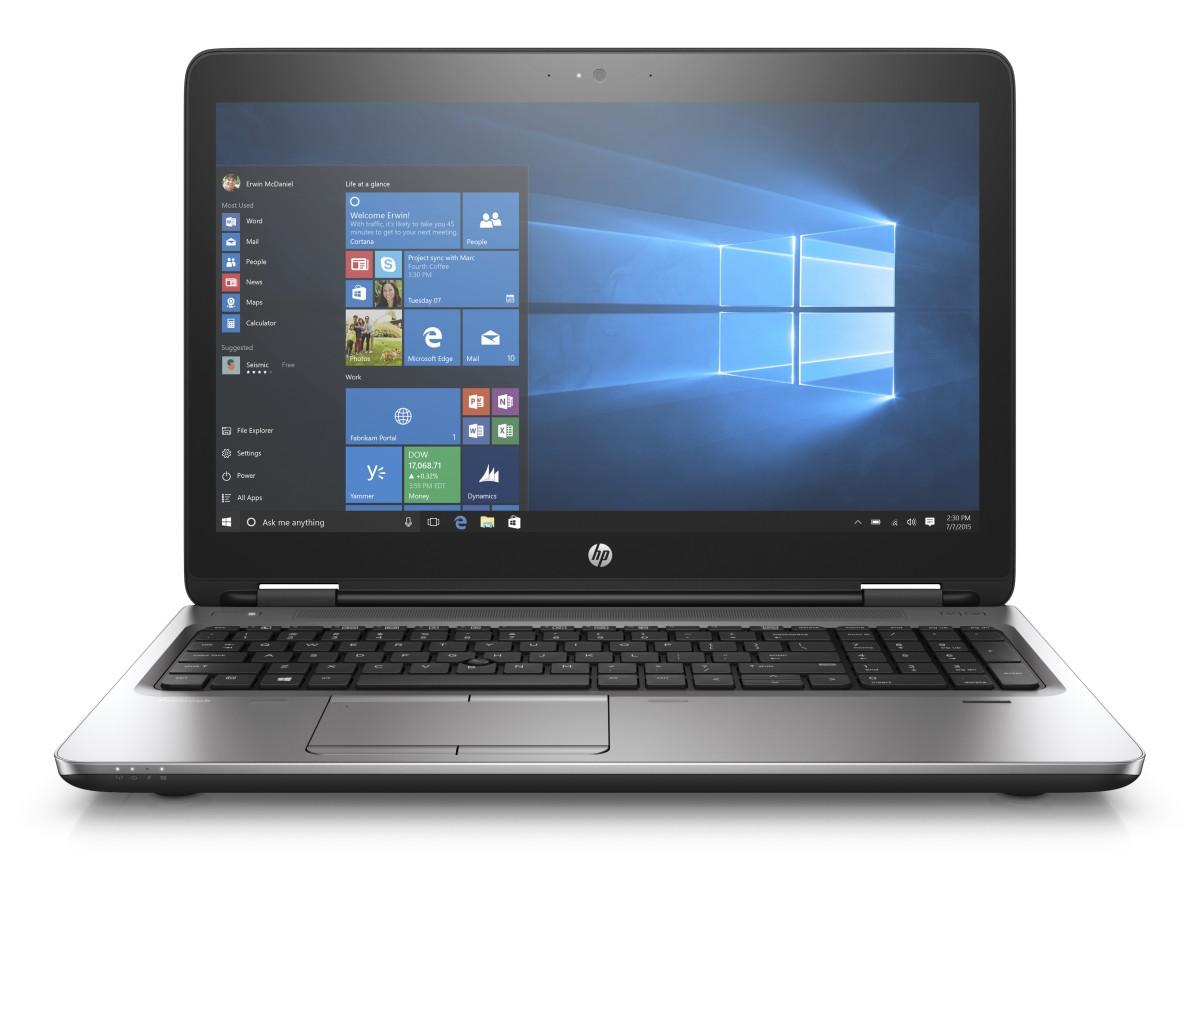 "Z2W19EA#BCM HP ProBook 655 G3 15.6"" FHD/A10-8730B/4GB/500GB/DVD/VGA/DP/SP/RJ45/WIFI/BT/MCR/FPR/1RServis/W10P"